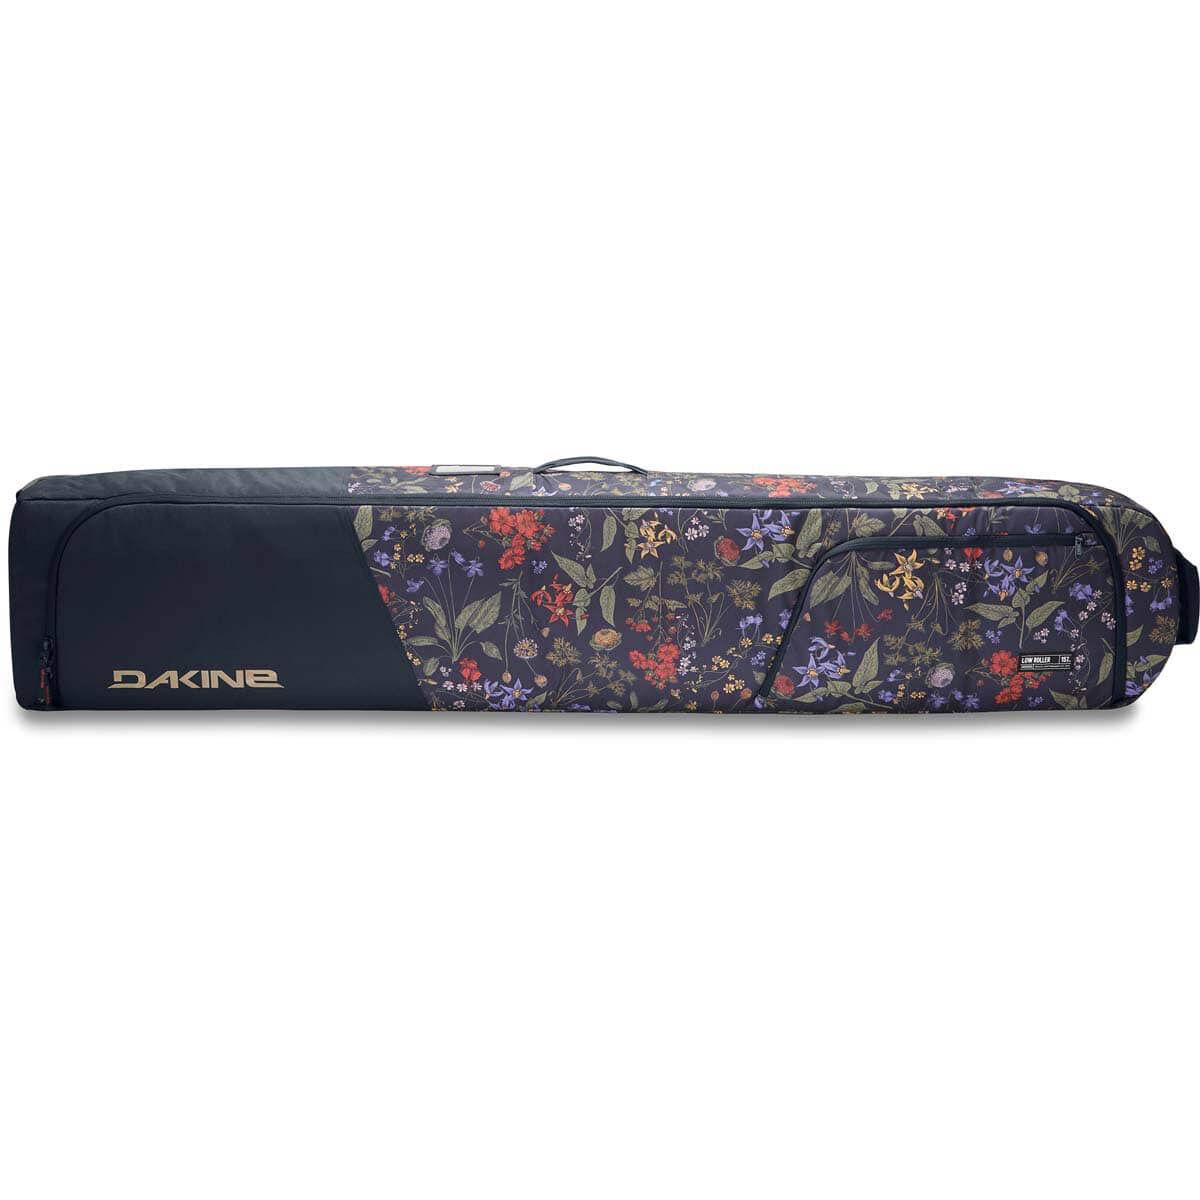 Dakine Low Roller Snowboard Bag 157 cm Snowboard Boardbag Botanics Pet